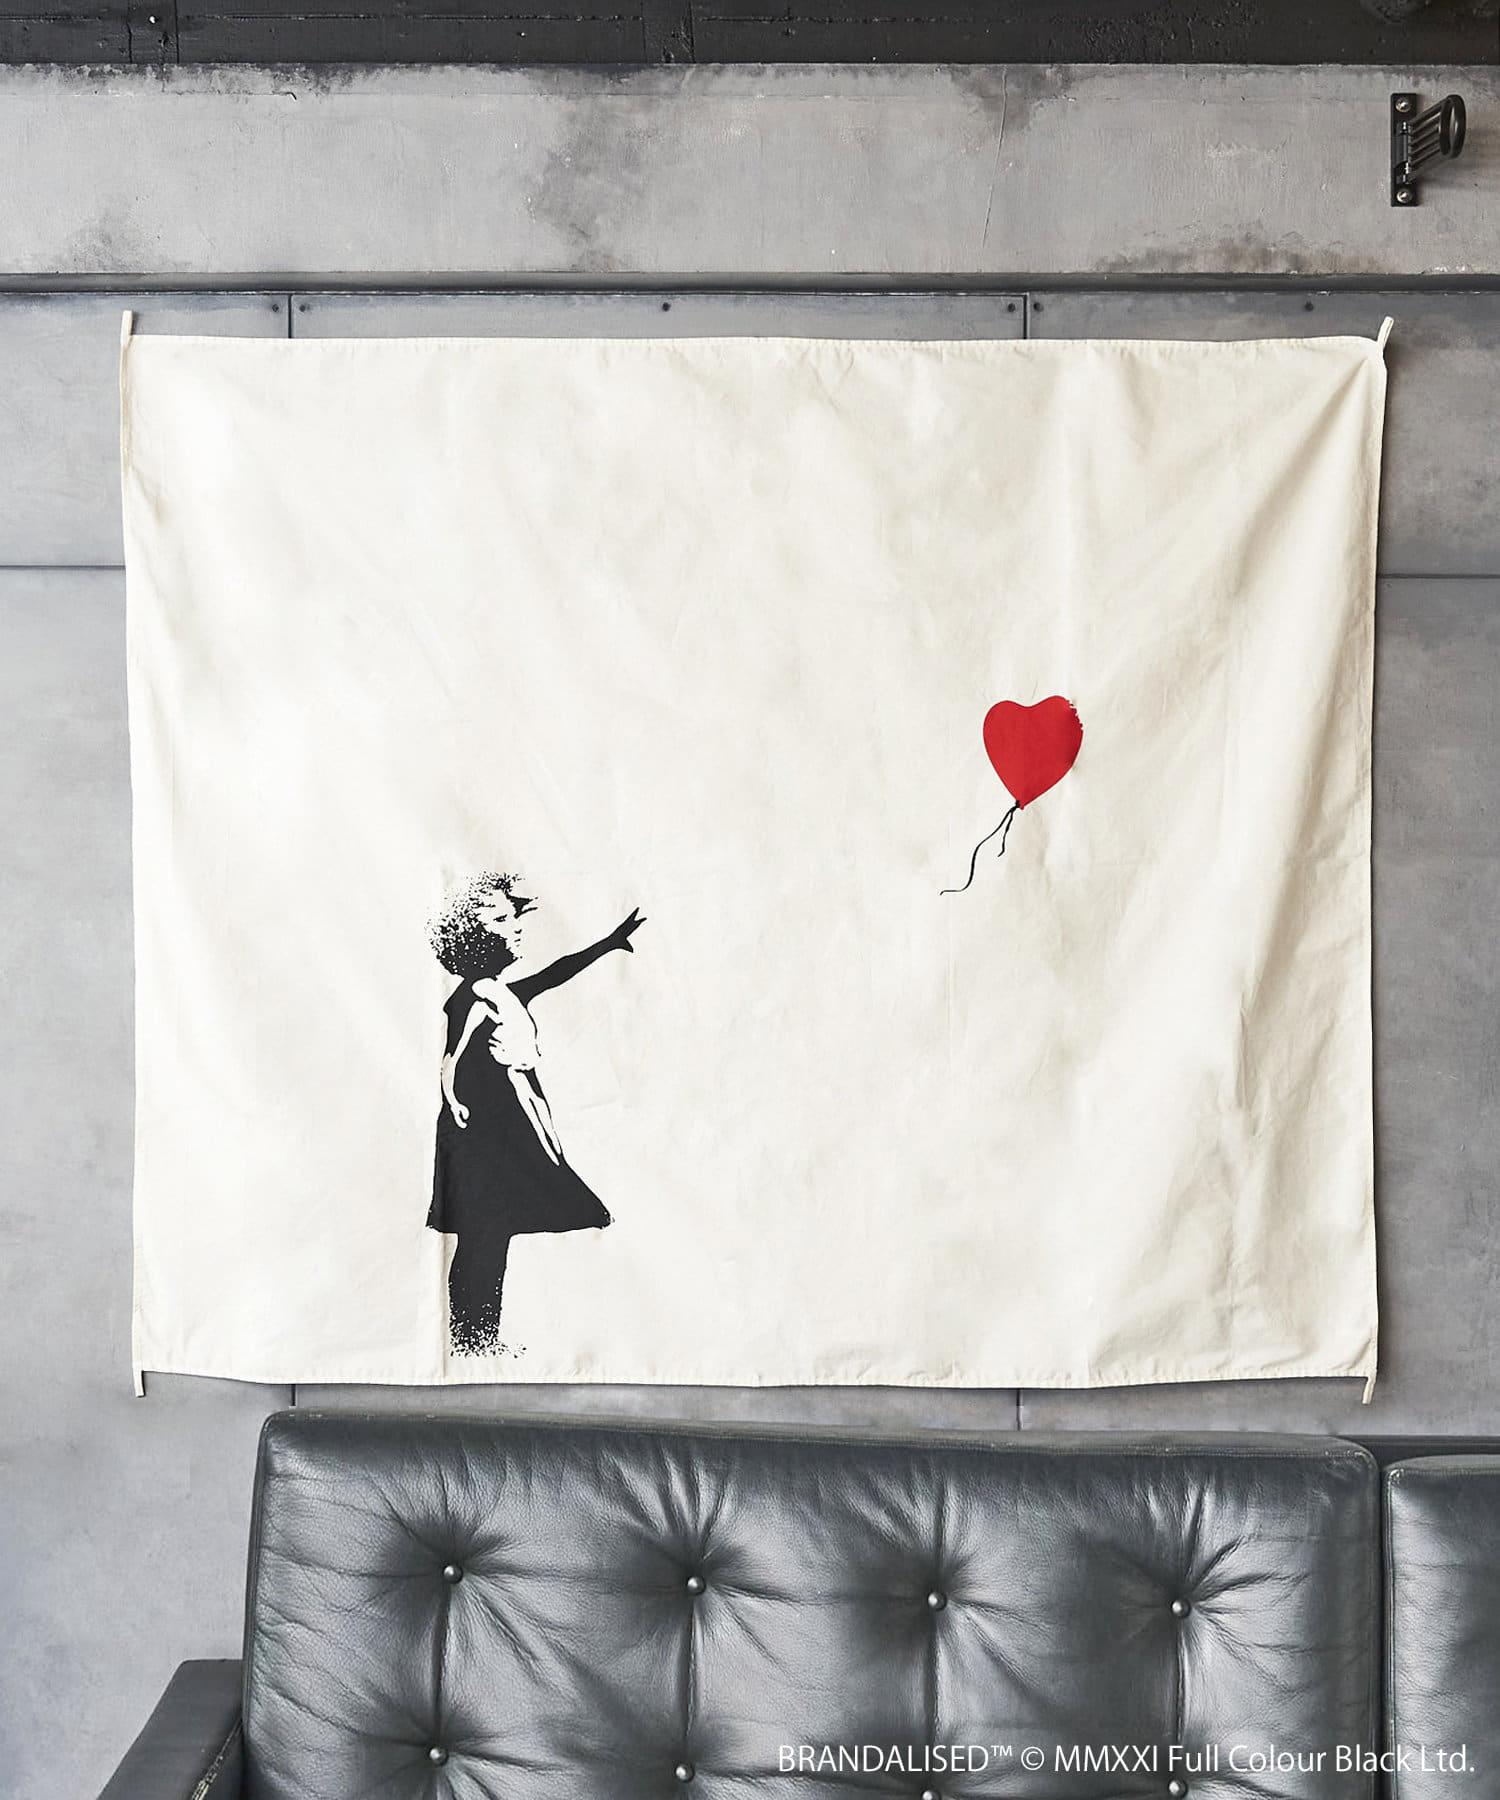 3COINS(スリーコインズ) 【ASOKO】Banksy's Graffiti ファブリックポスター(L)